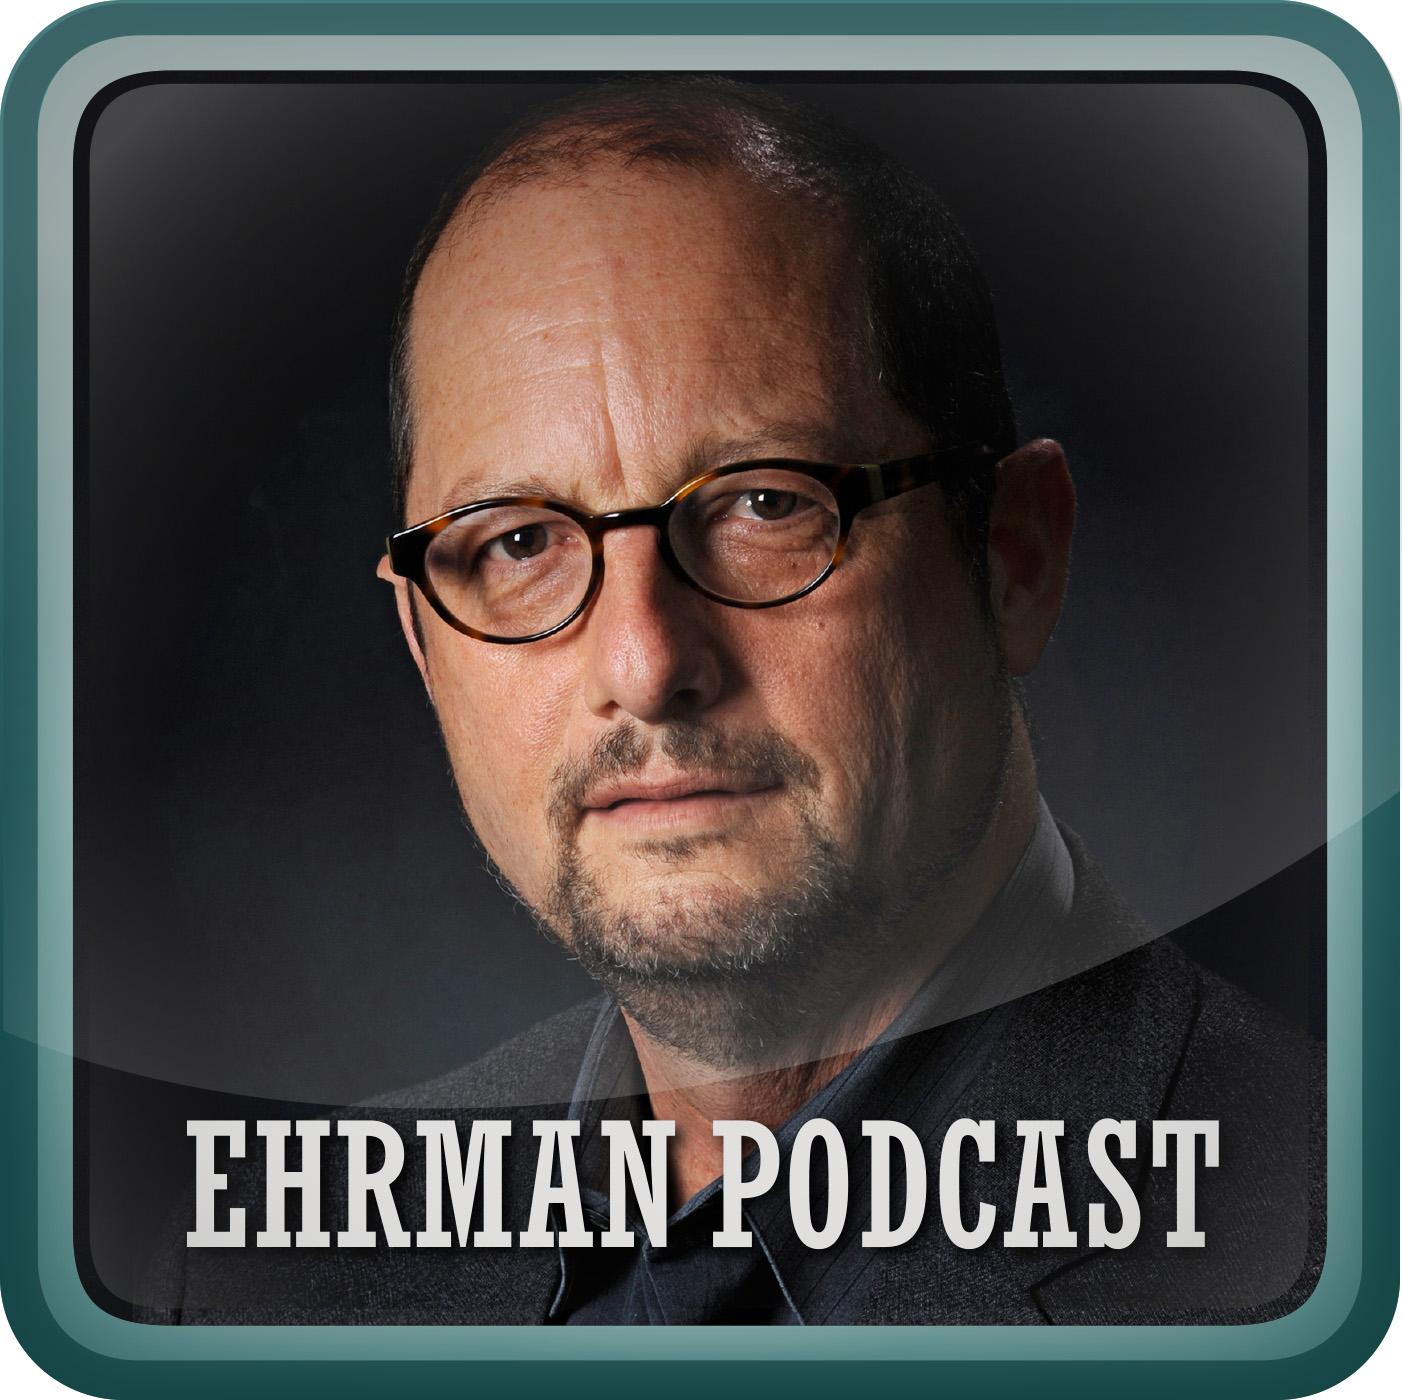 The Bart Ehrman Blog Podcast show art